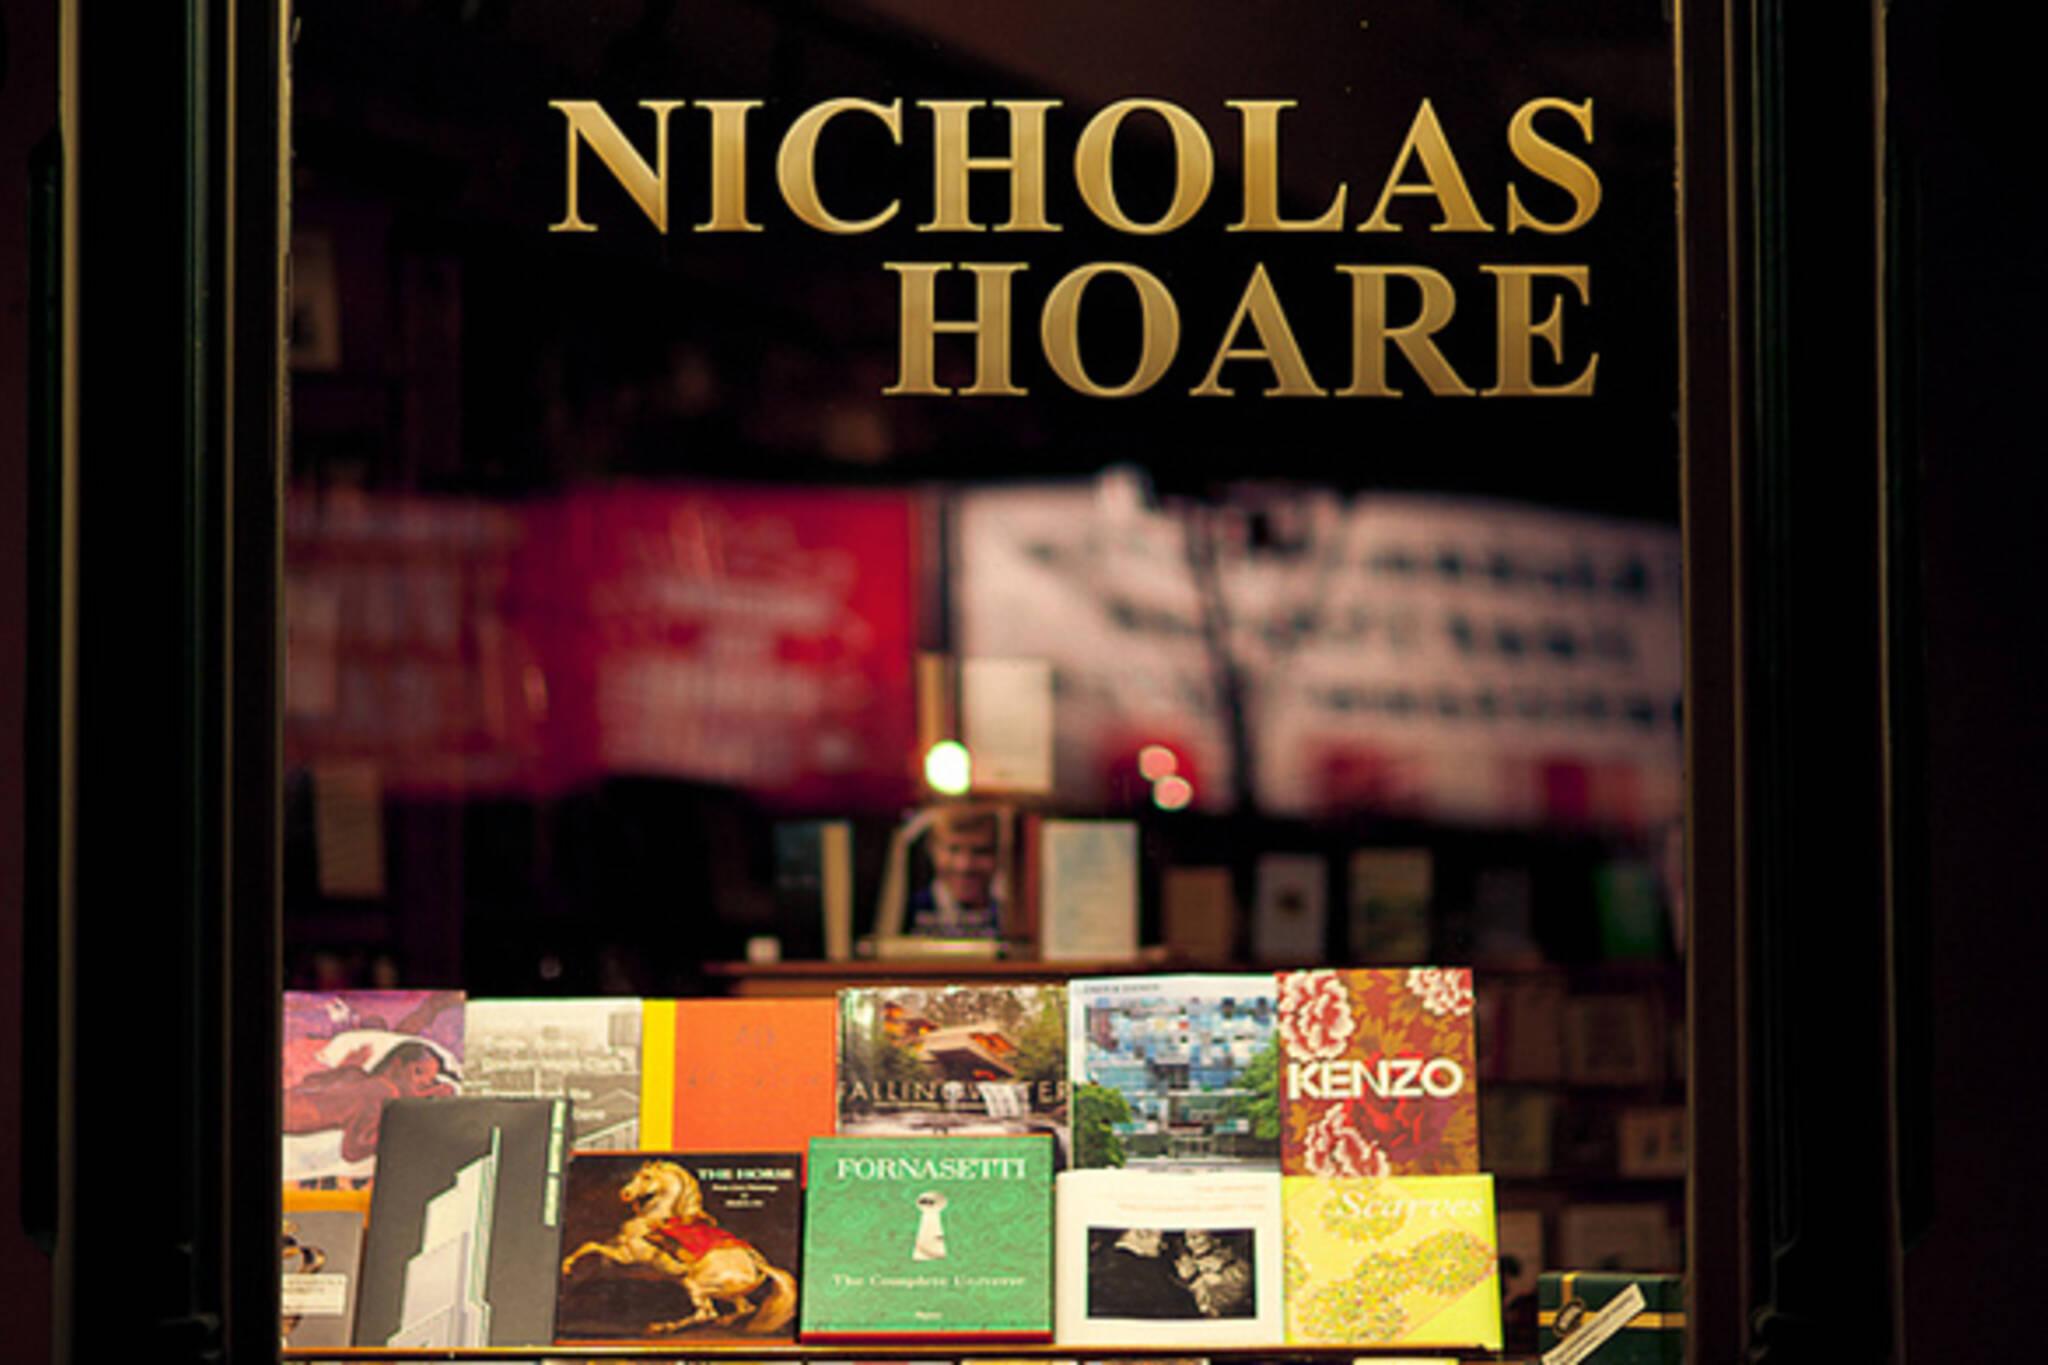 Nicholas Hoare